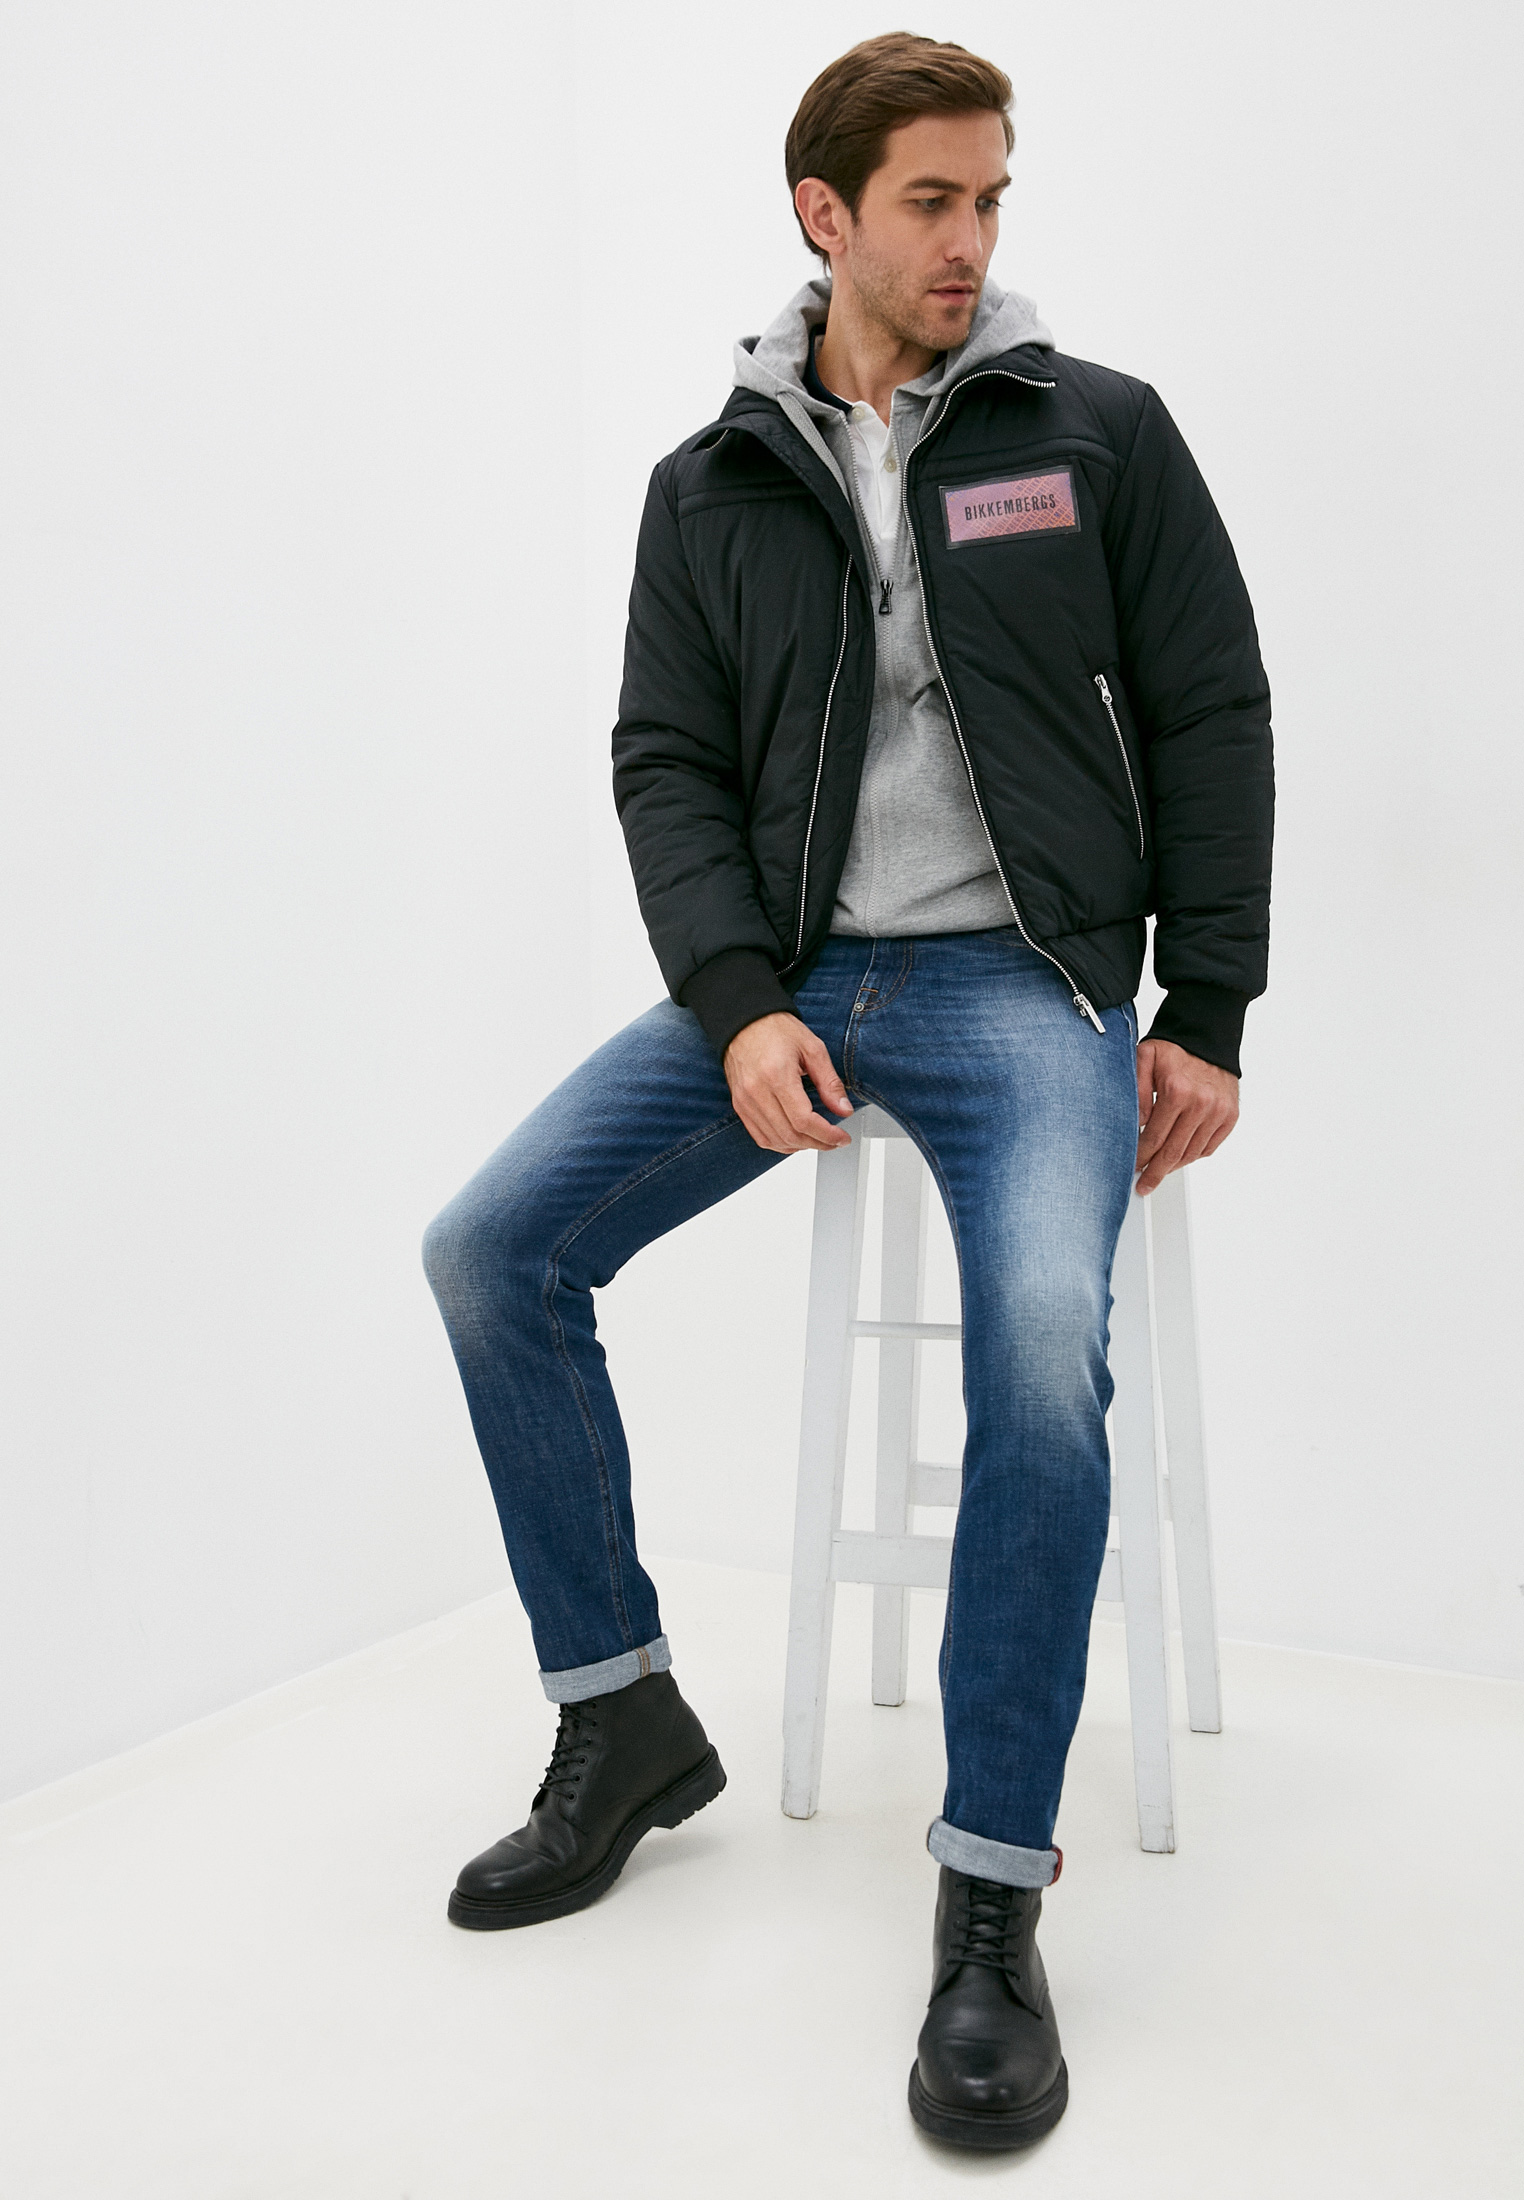 Мужская куртка Bikkembergs (Биккембергс) C H 130 00 S 3464: изображение 3